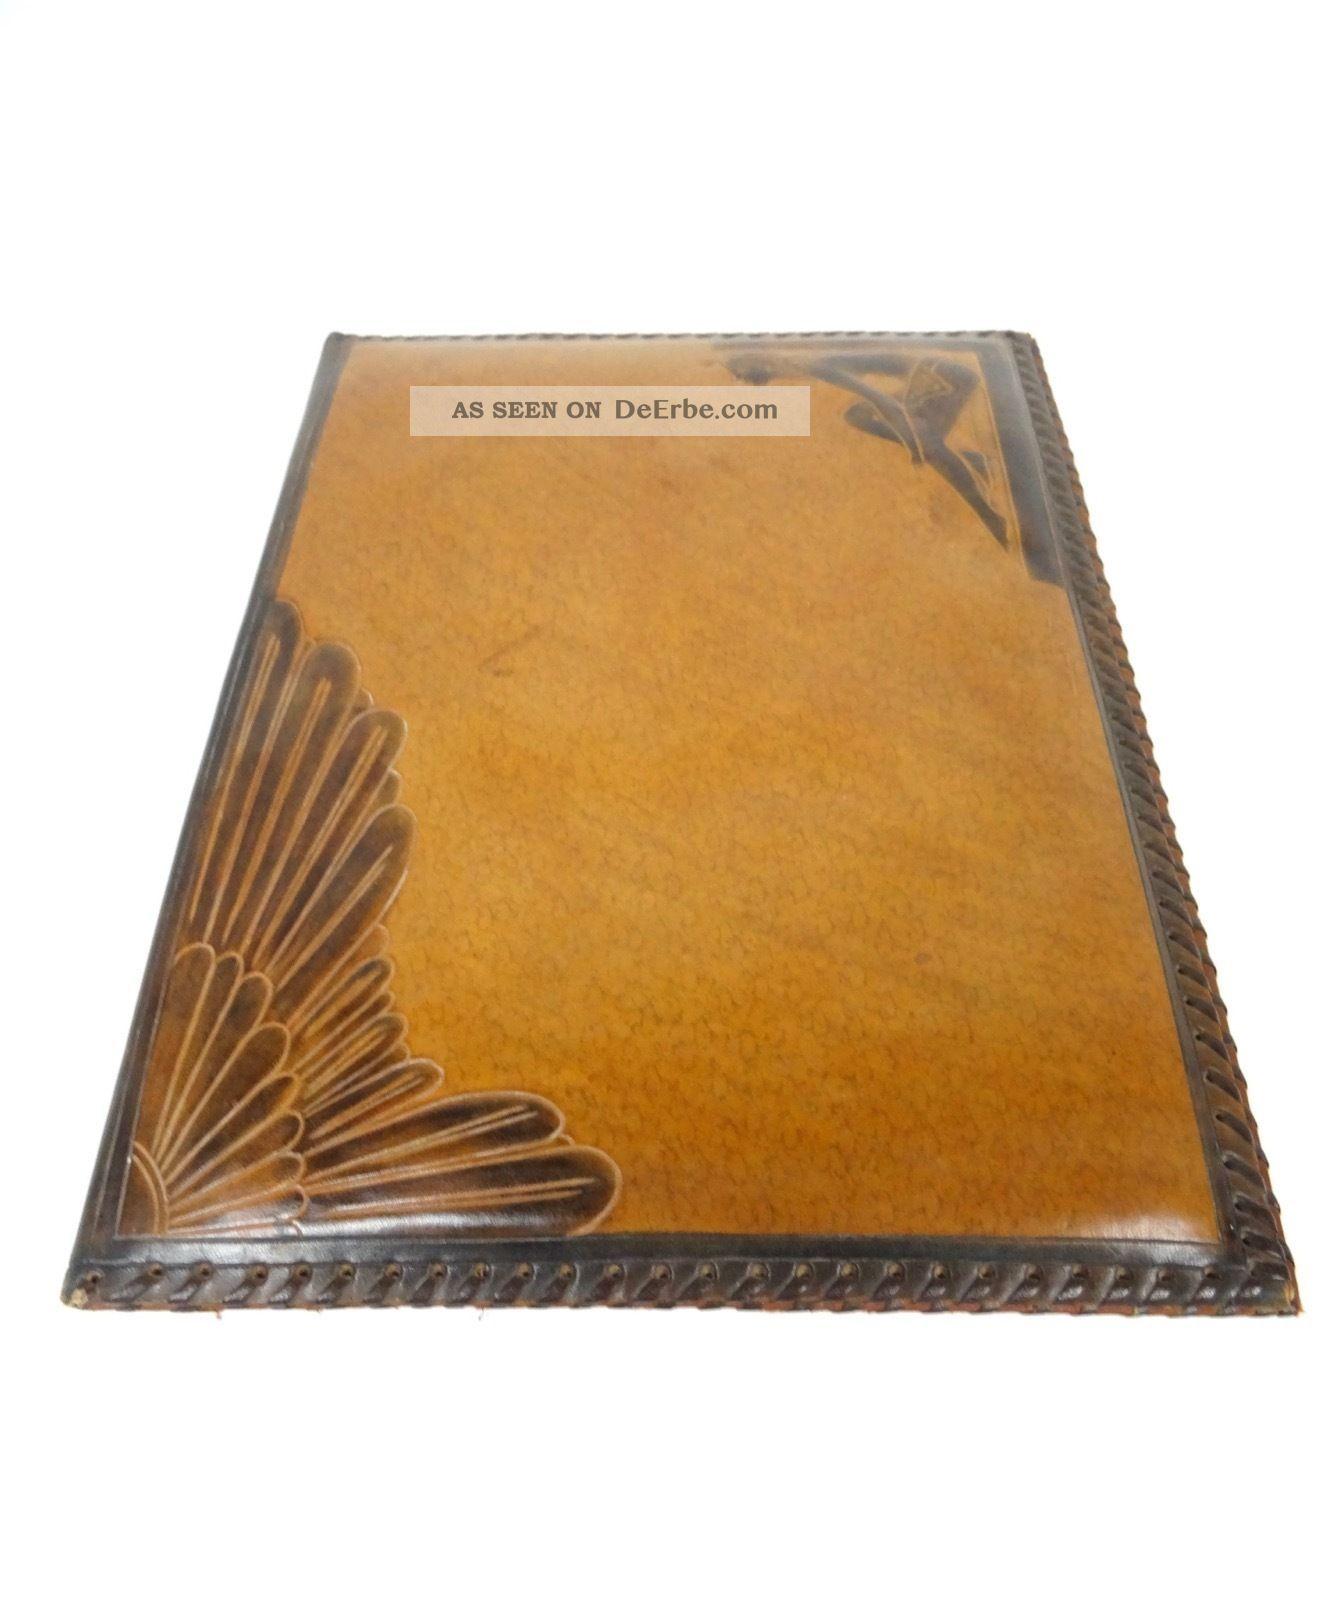 Art Deco MeisterstÜck Leder Schreibmappe Dokumentenmappe Signiert Satvy Um 1920 1920-1949, Art Déco Bild